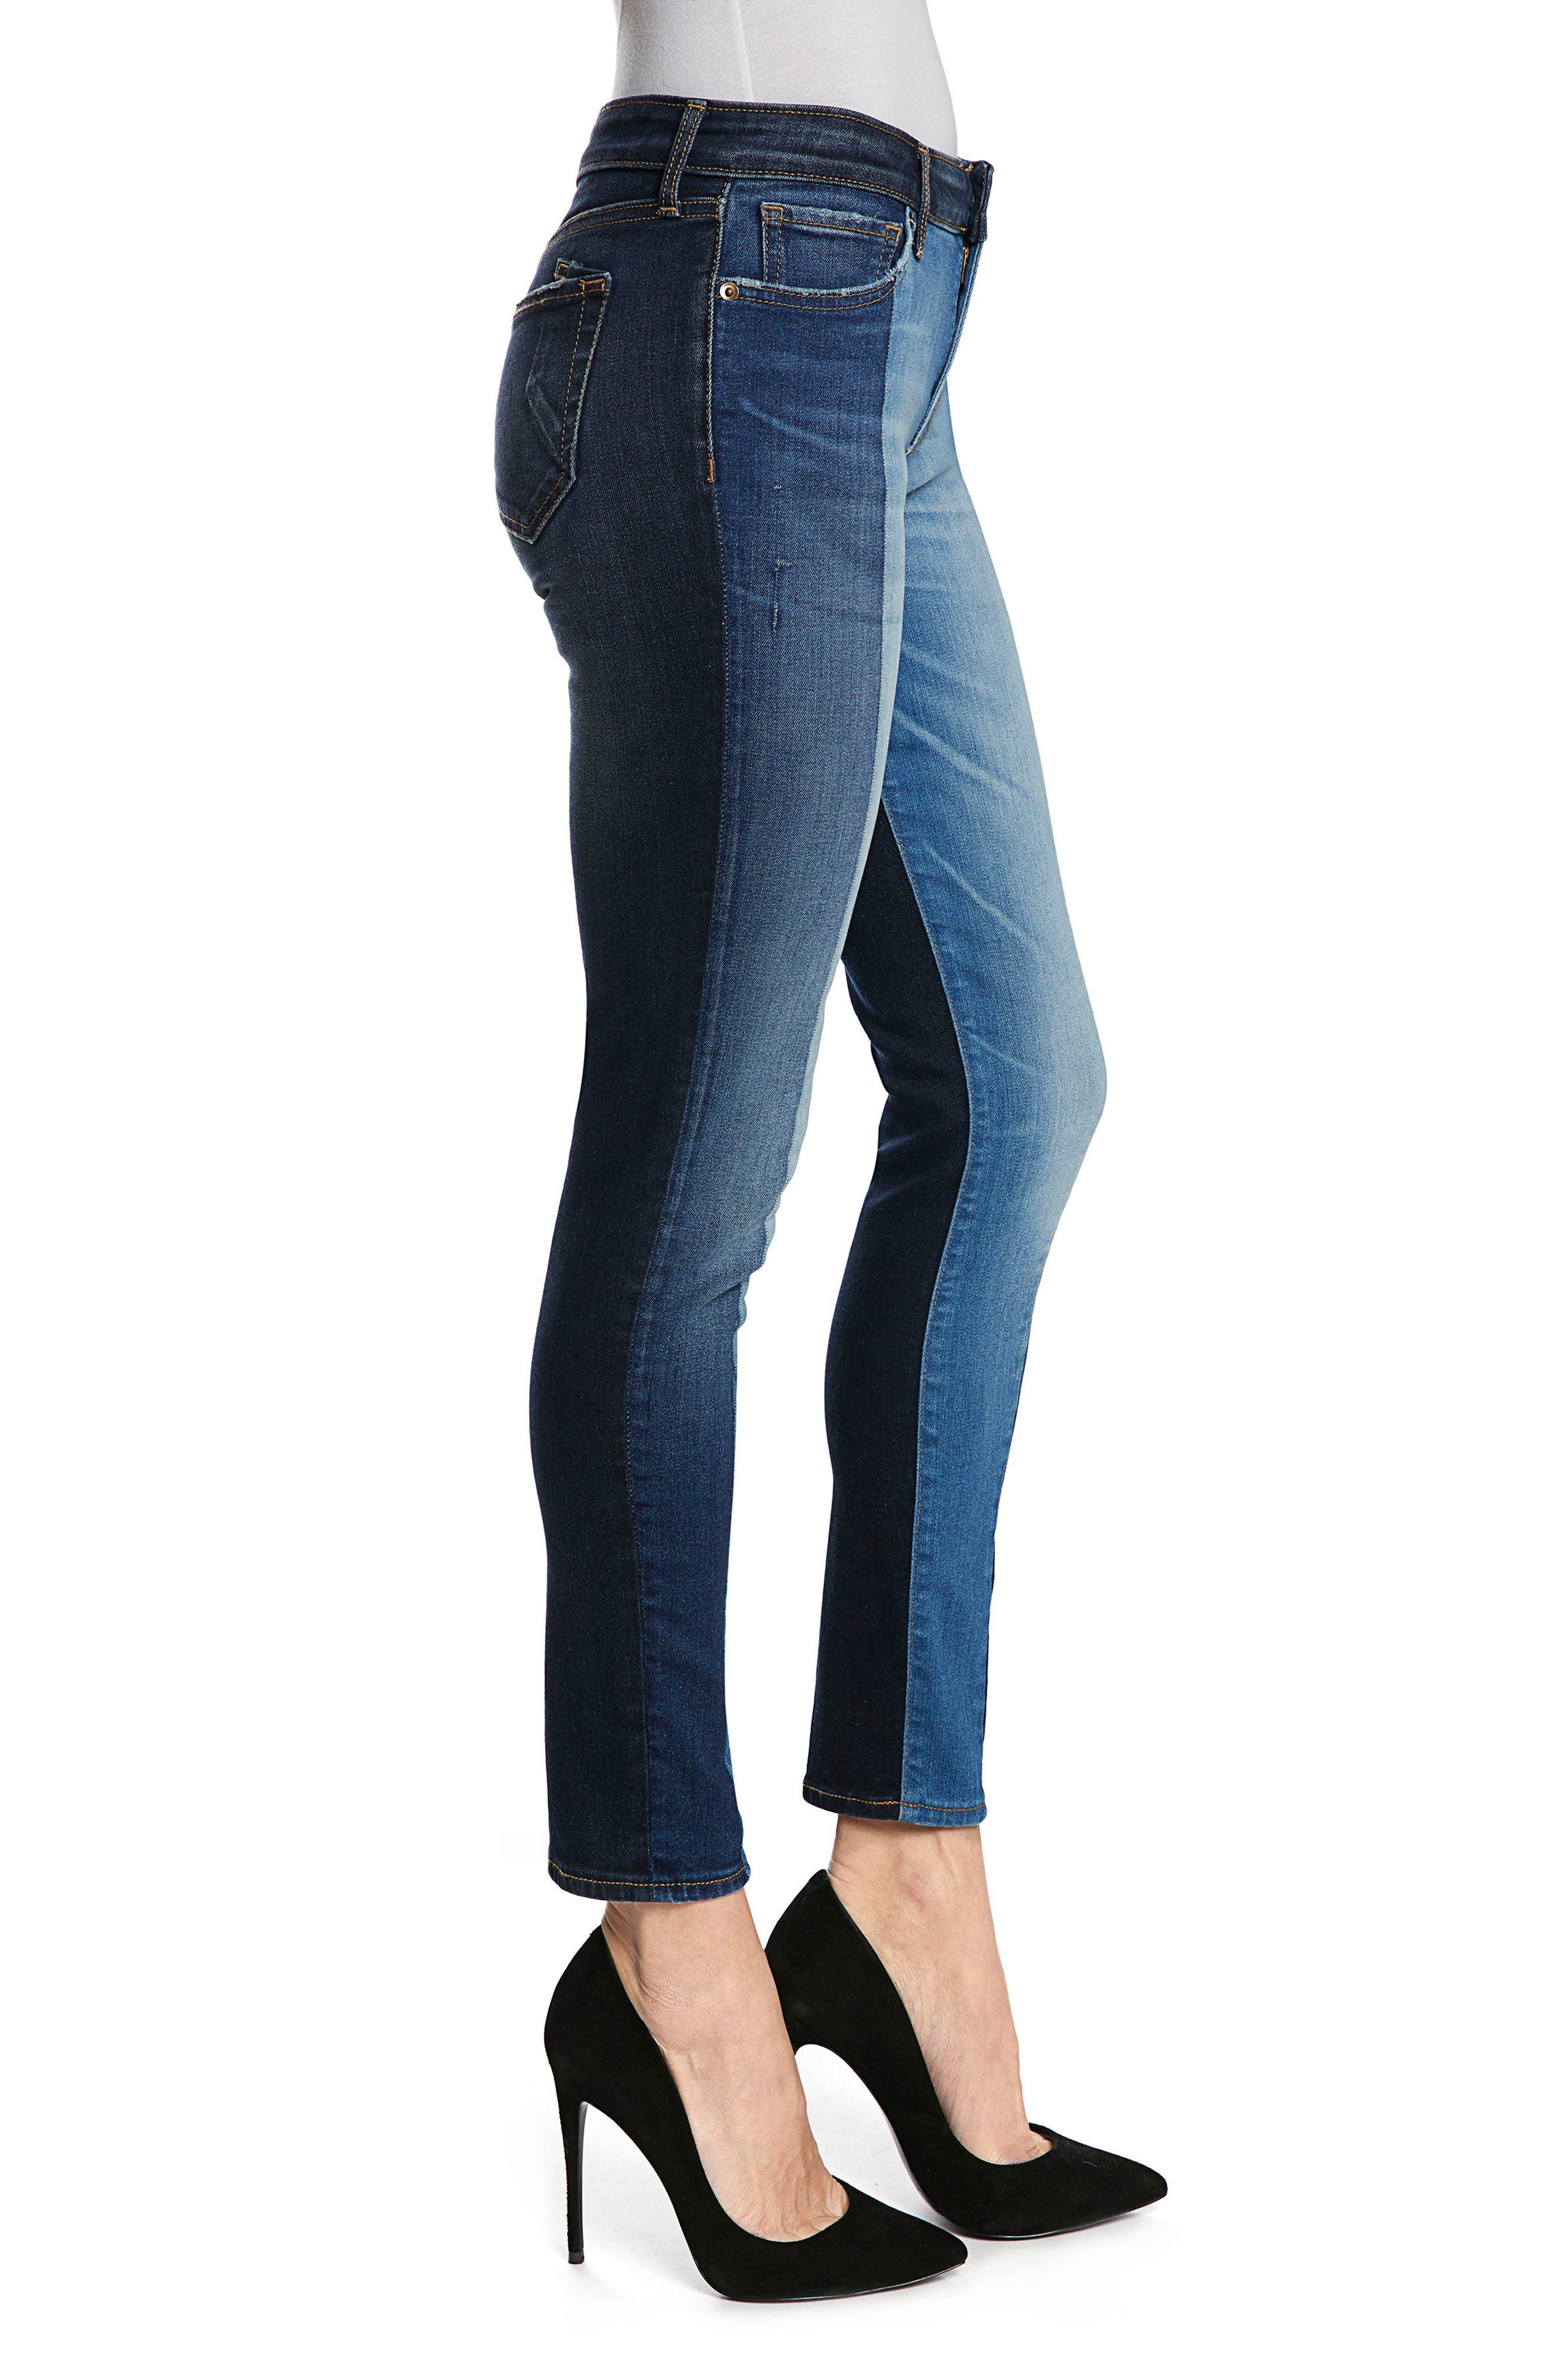 Camaro Ankle Skinny Jeans,                             Alternate thumbnail 3, color,                             Indigo